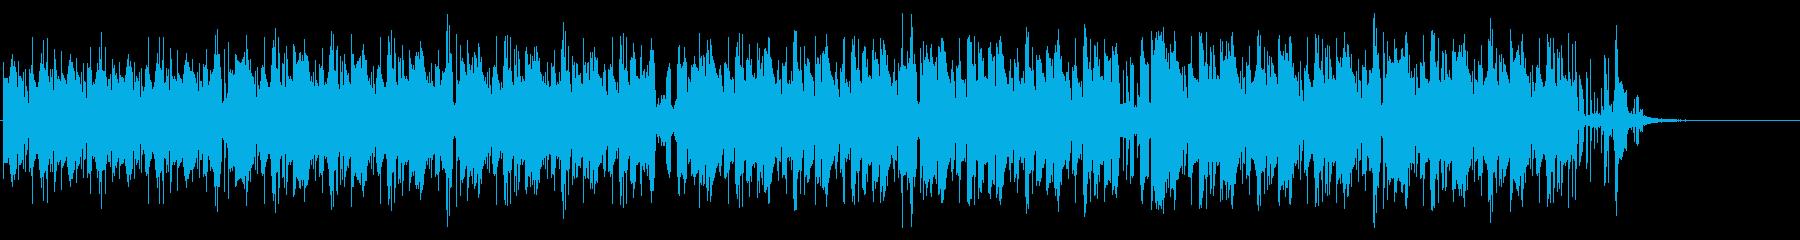 texture8の再生済みの波形